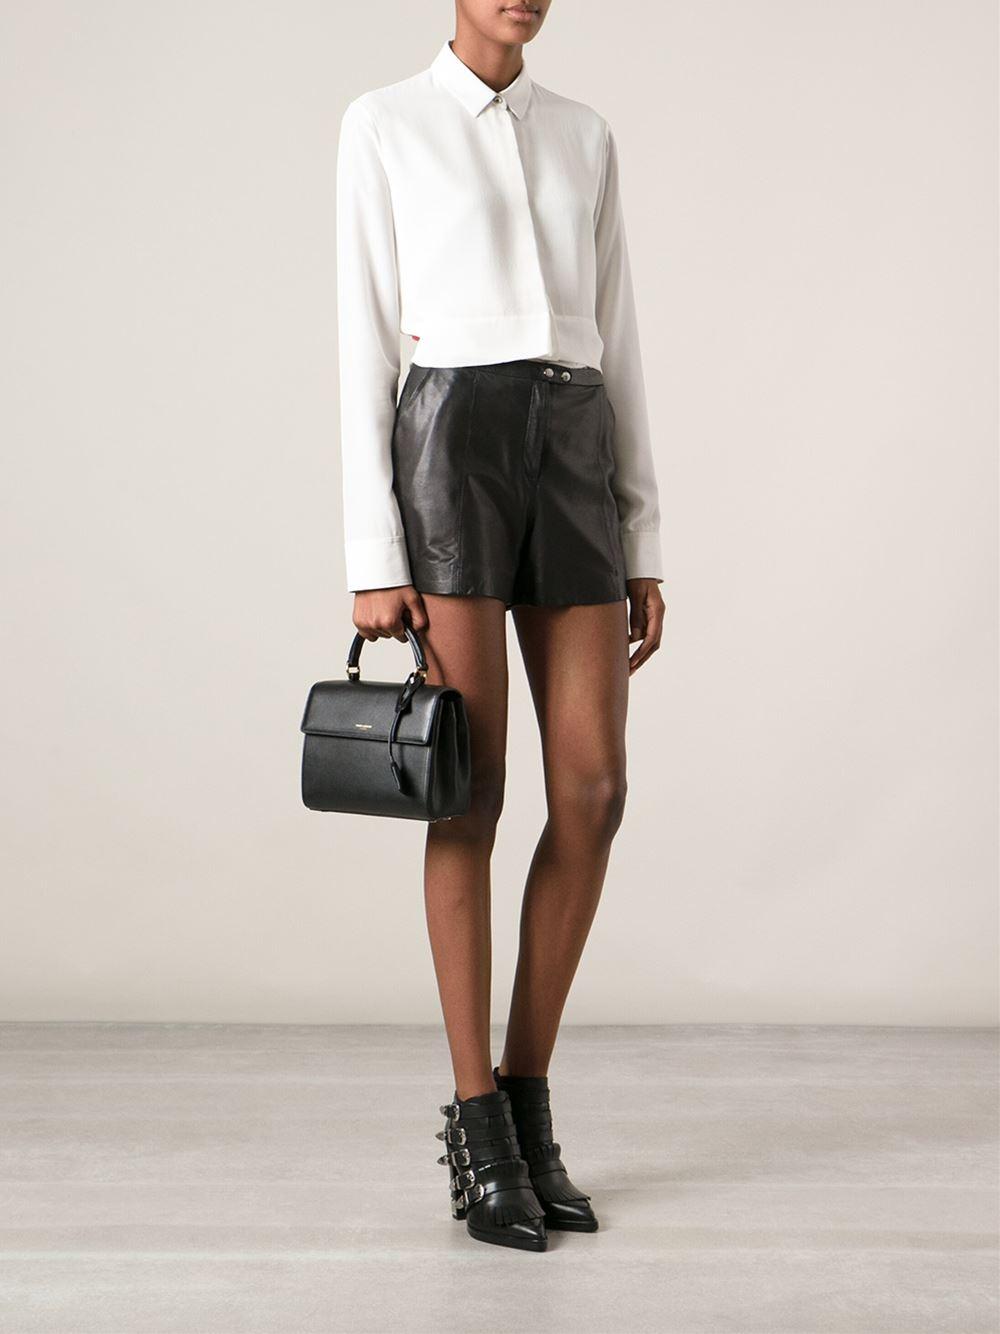 ysl wallet replica - yves saint laurent high school small chain bag, saint laurant bag